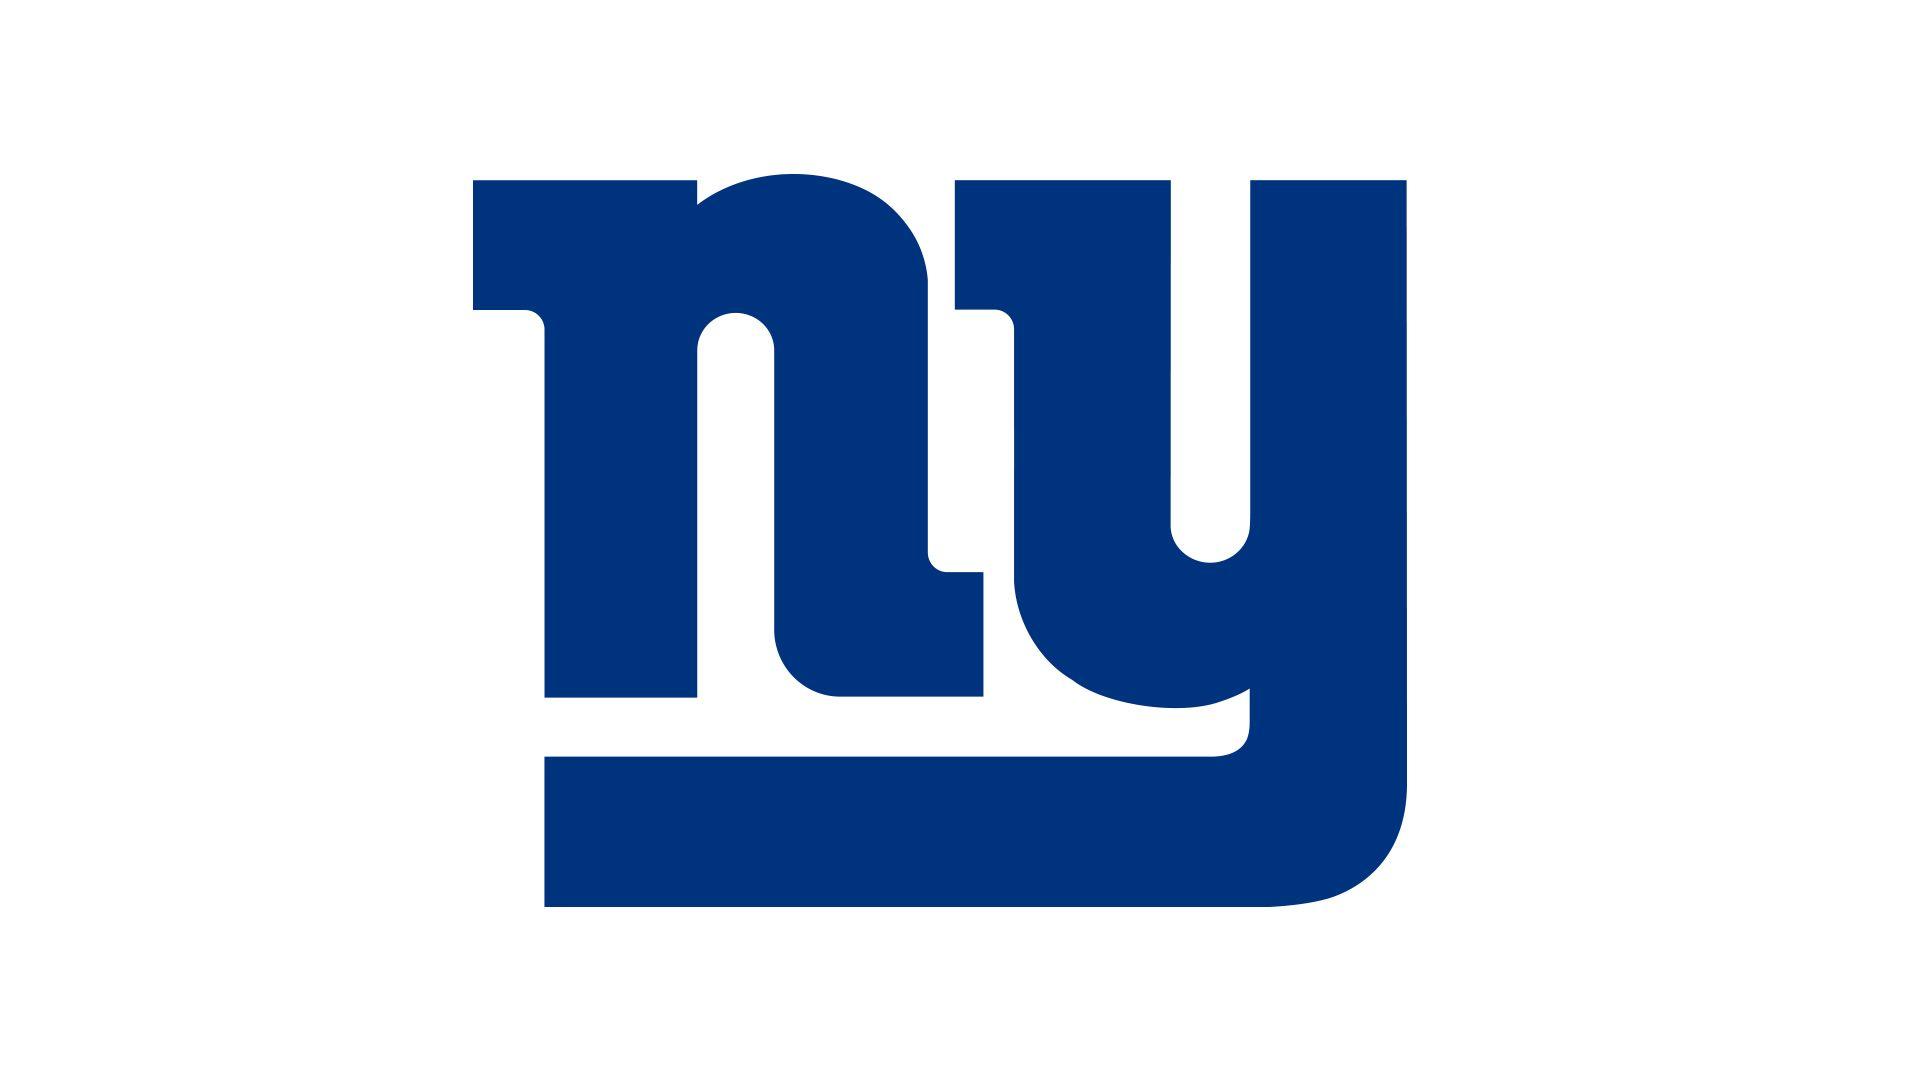 Giants.com